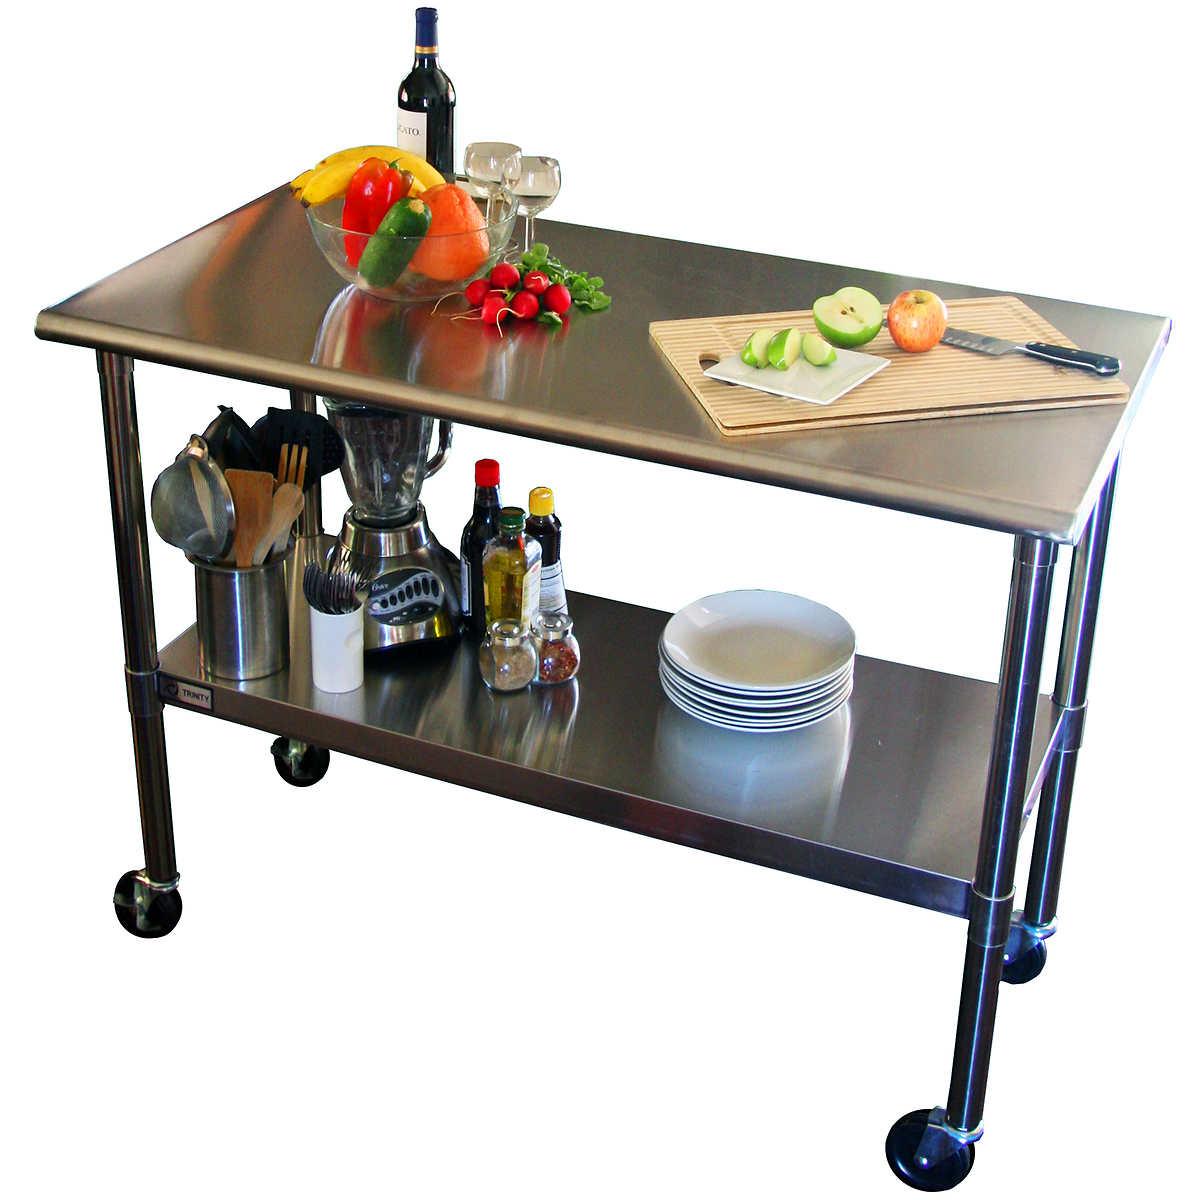 Restaurant stainless steel kitchen work prep table nsf chef shelf com - Trinity Ecostorage Nsf Stainless Steel Prep Table With Wheels